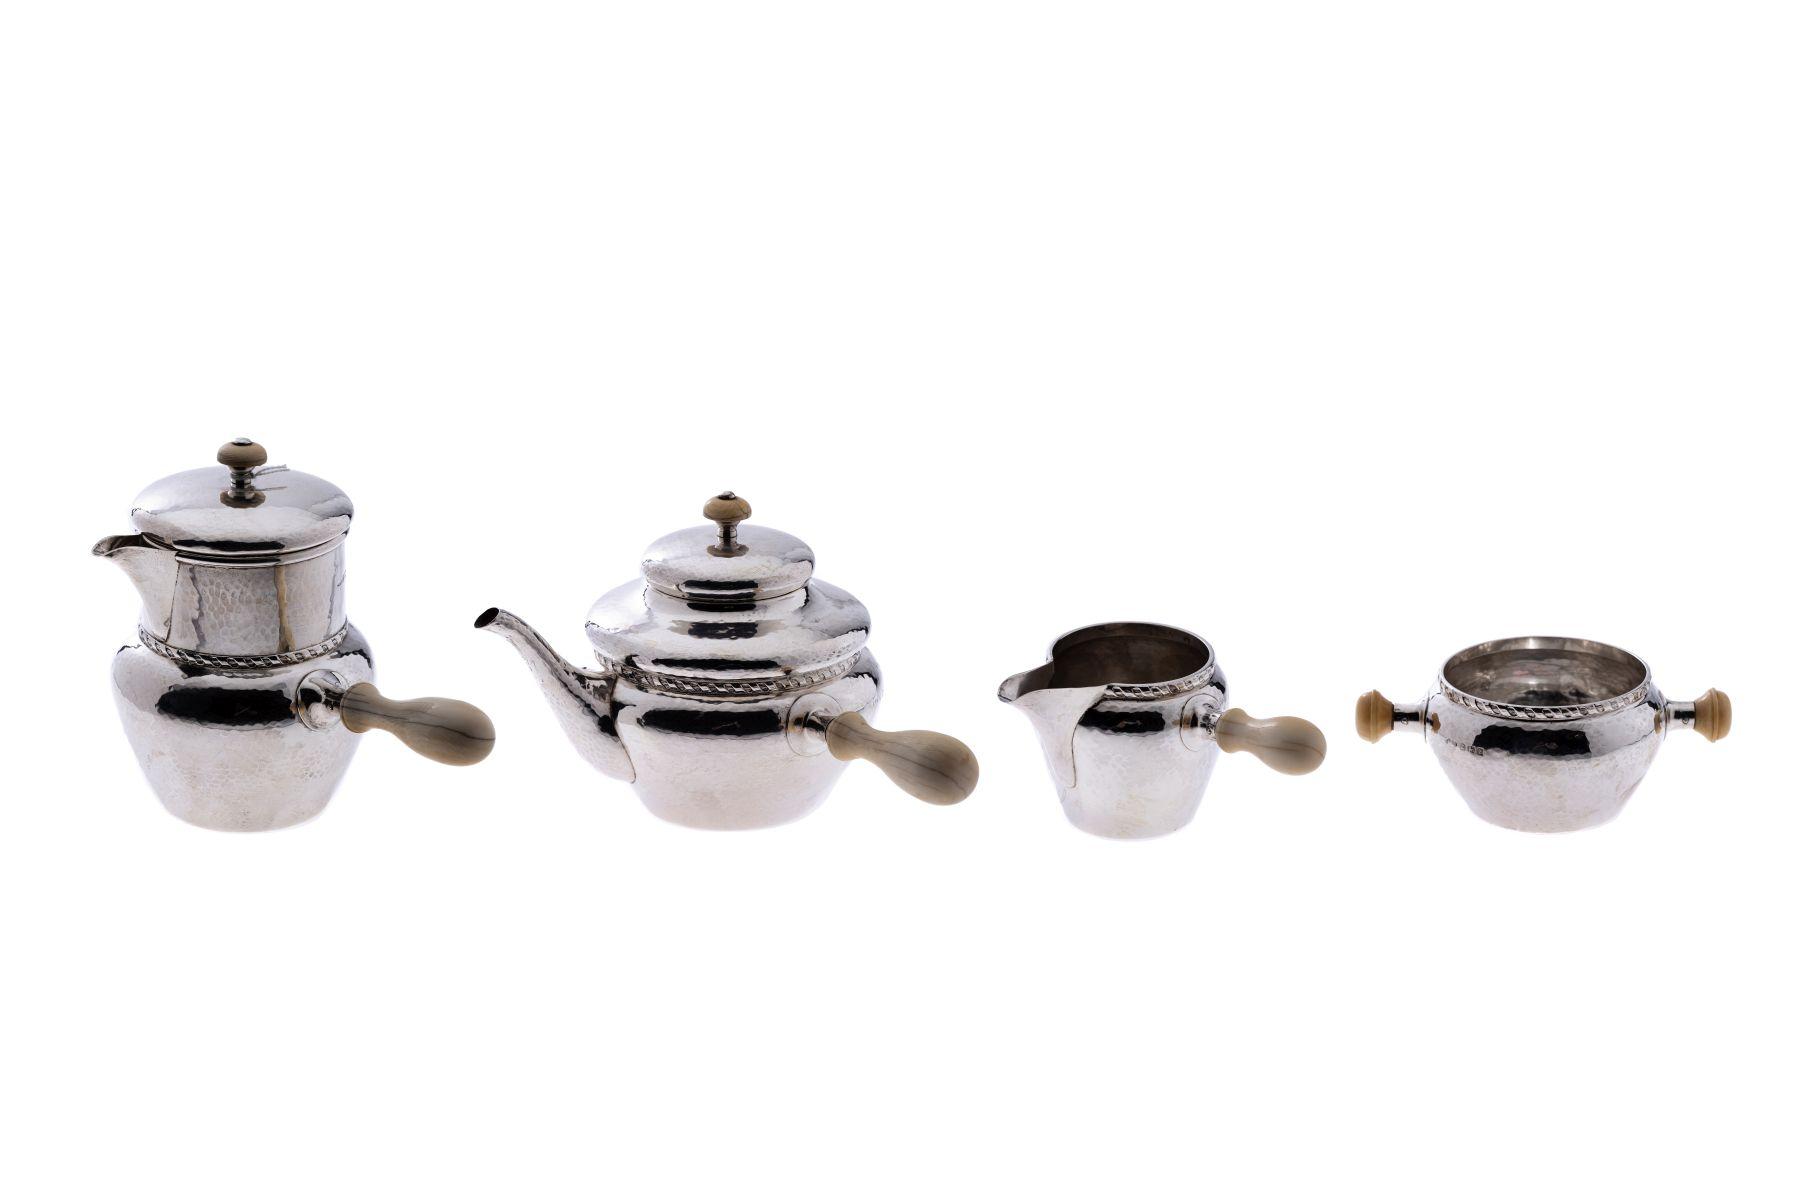 #31 Albert E. Jones 4-piece coffee and tea set 1924/28 | Albert E. Jones 4 teiliges Kaffee-und Teeservice 1924/28 Image